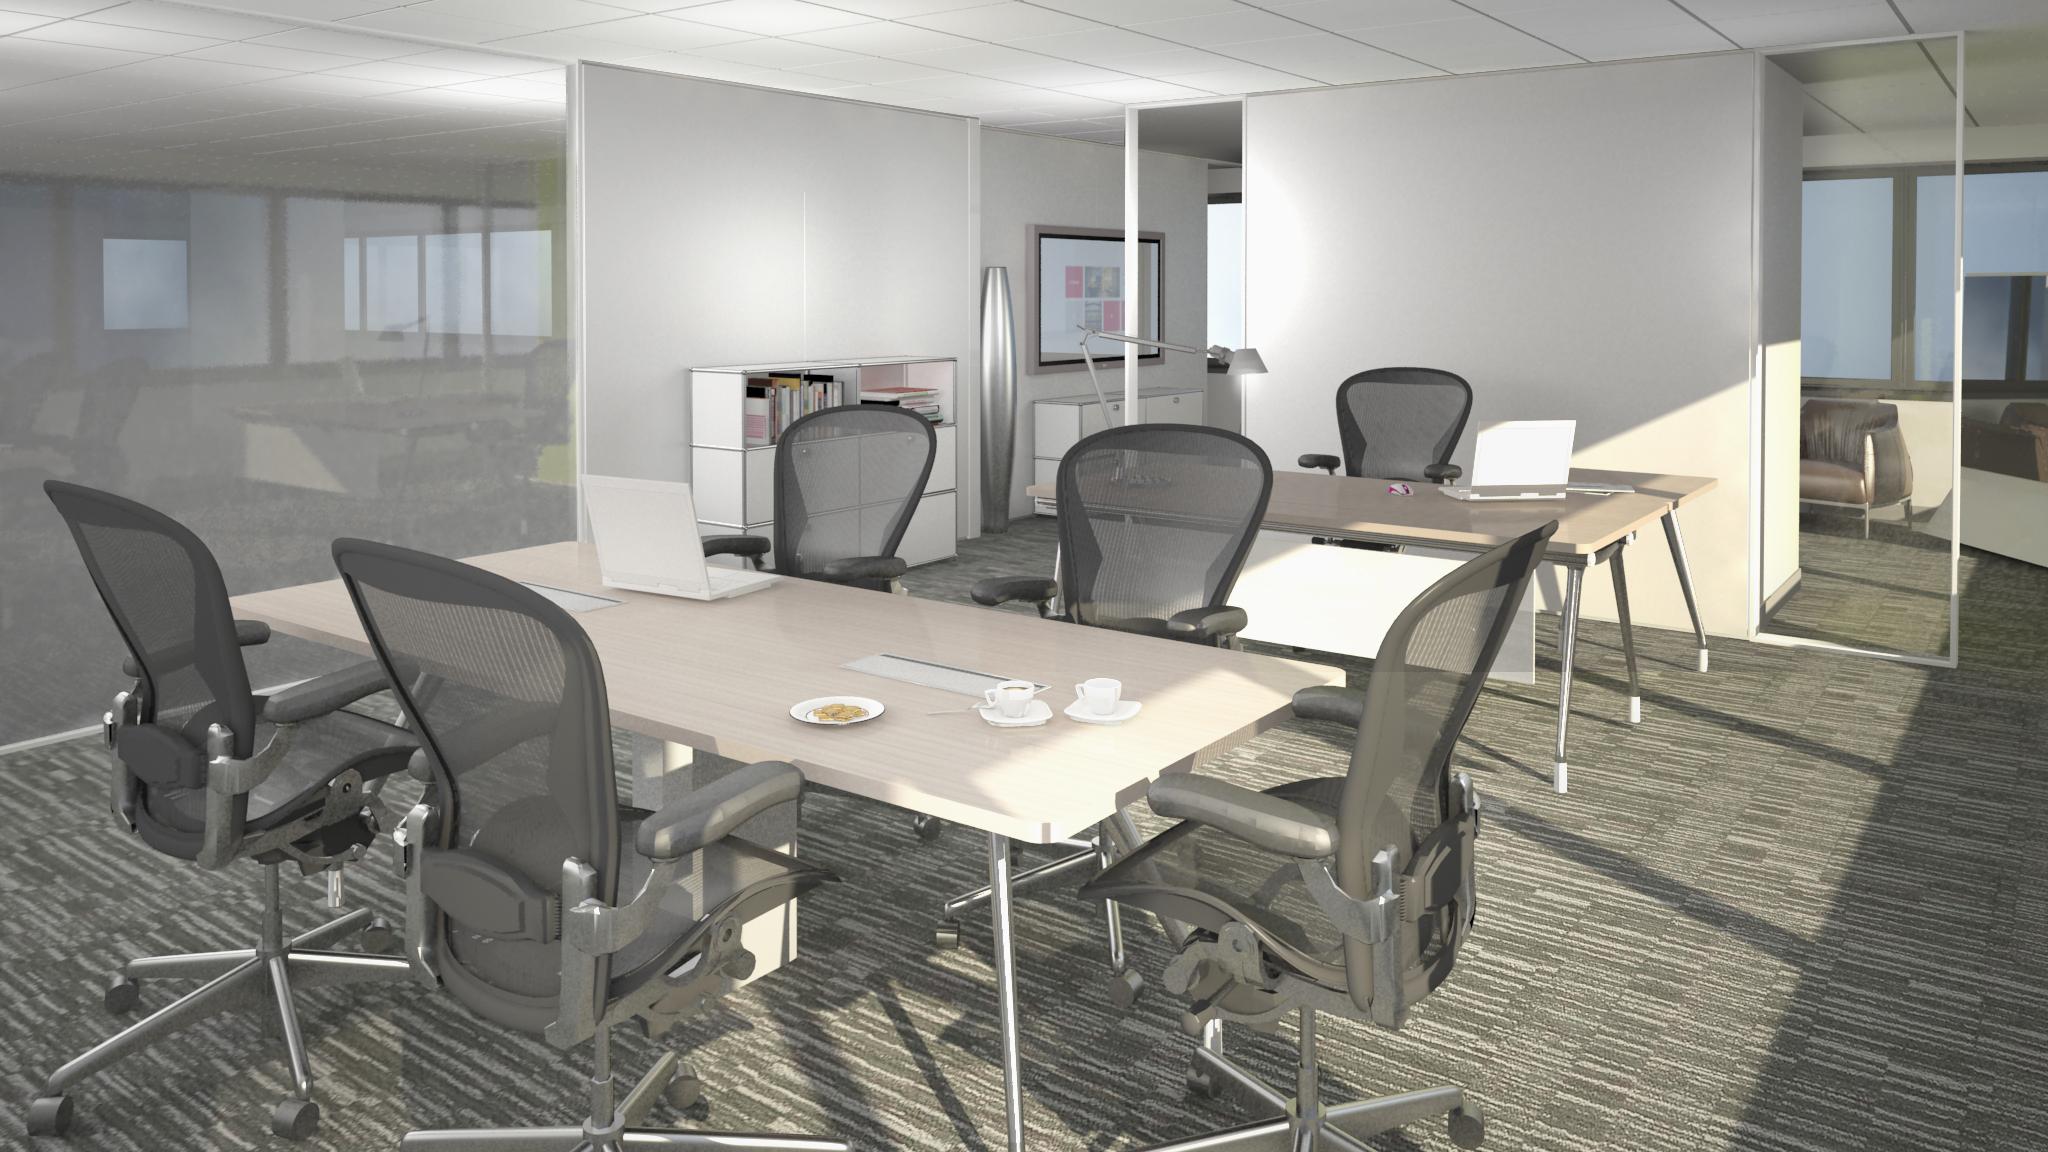 Artdesk - Other design